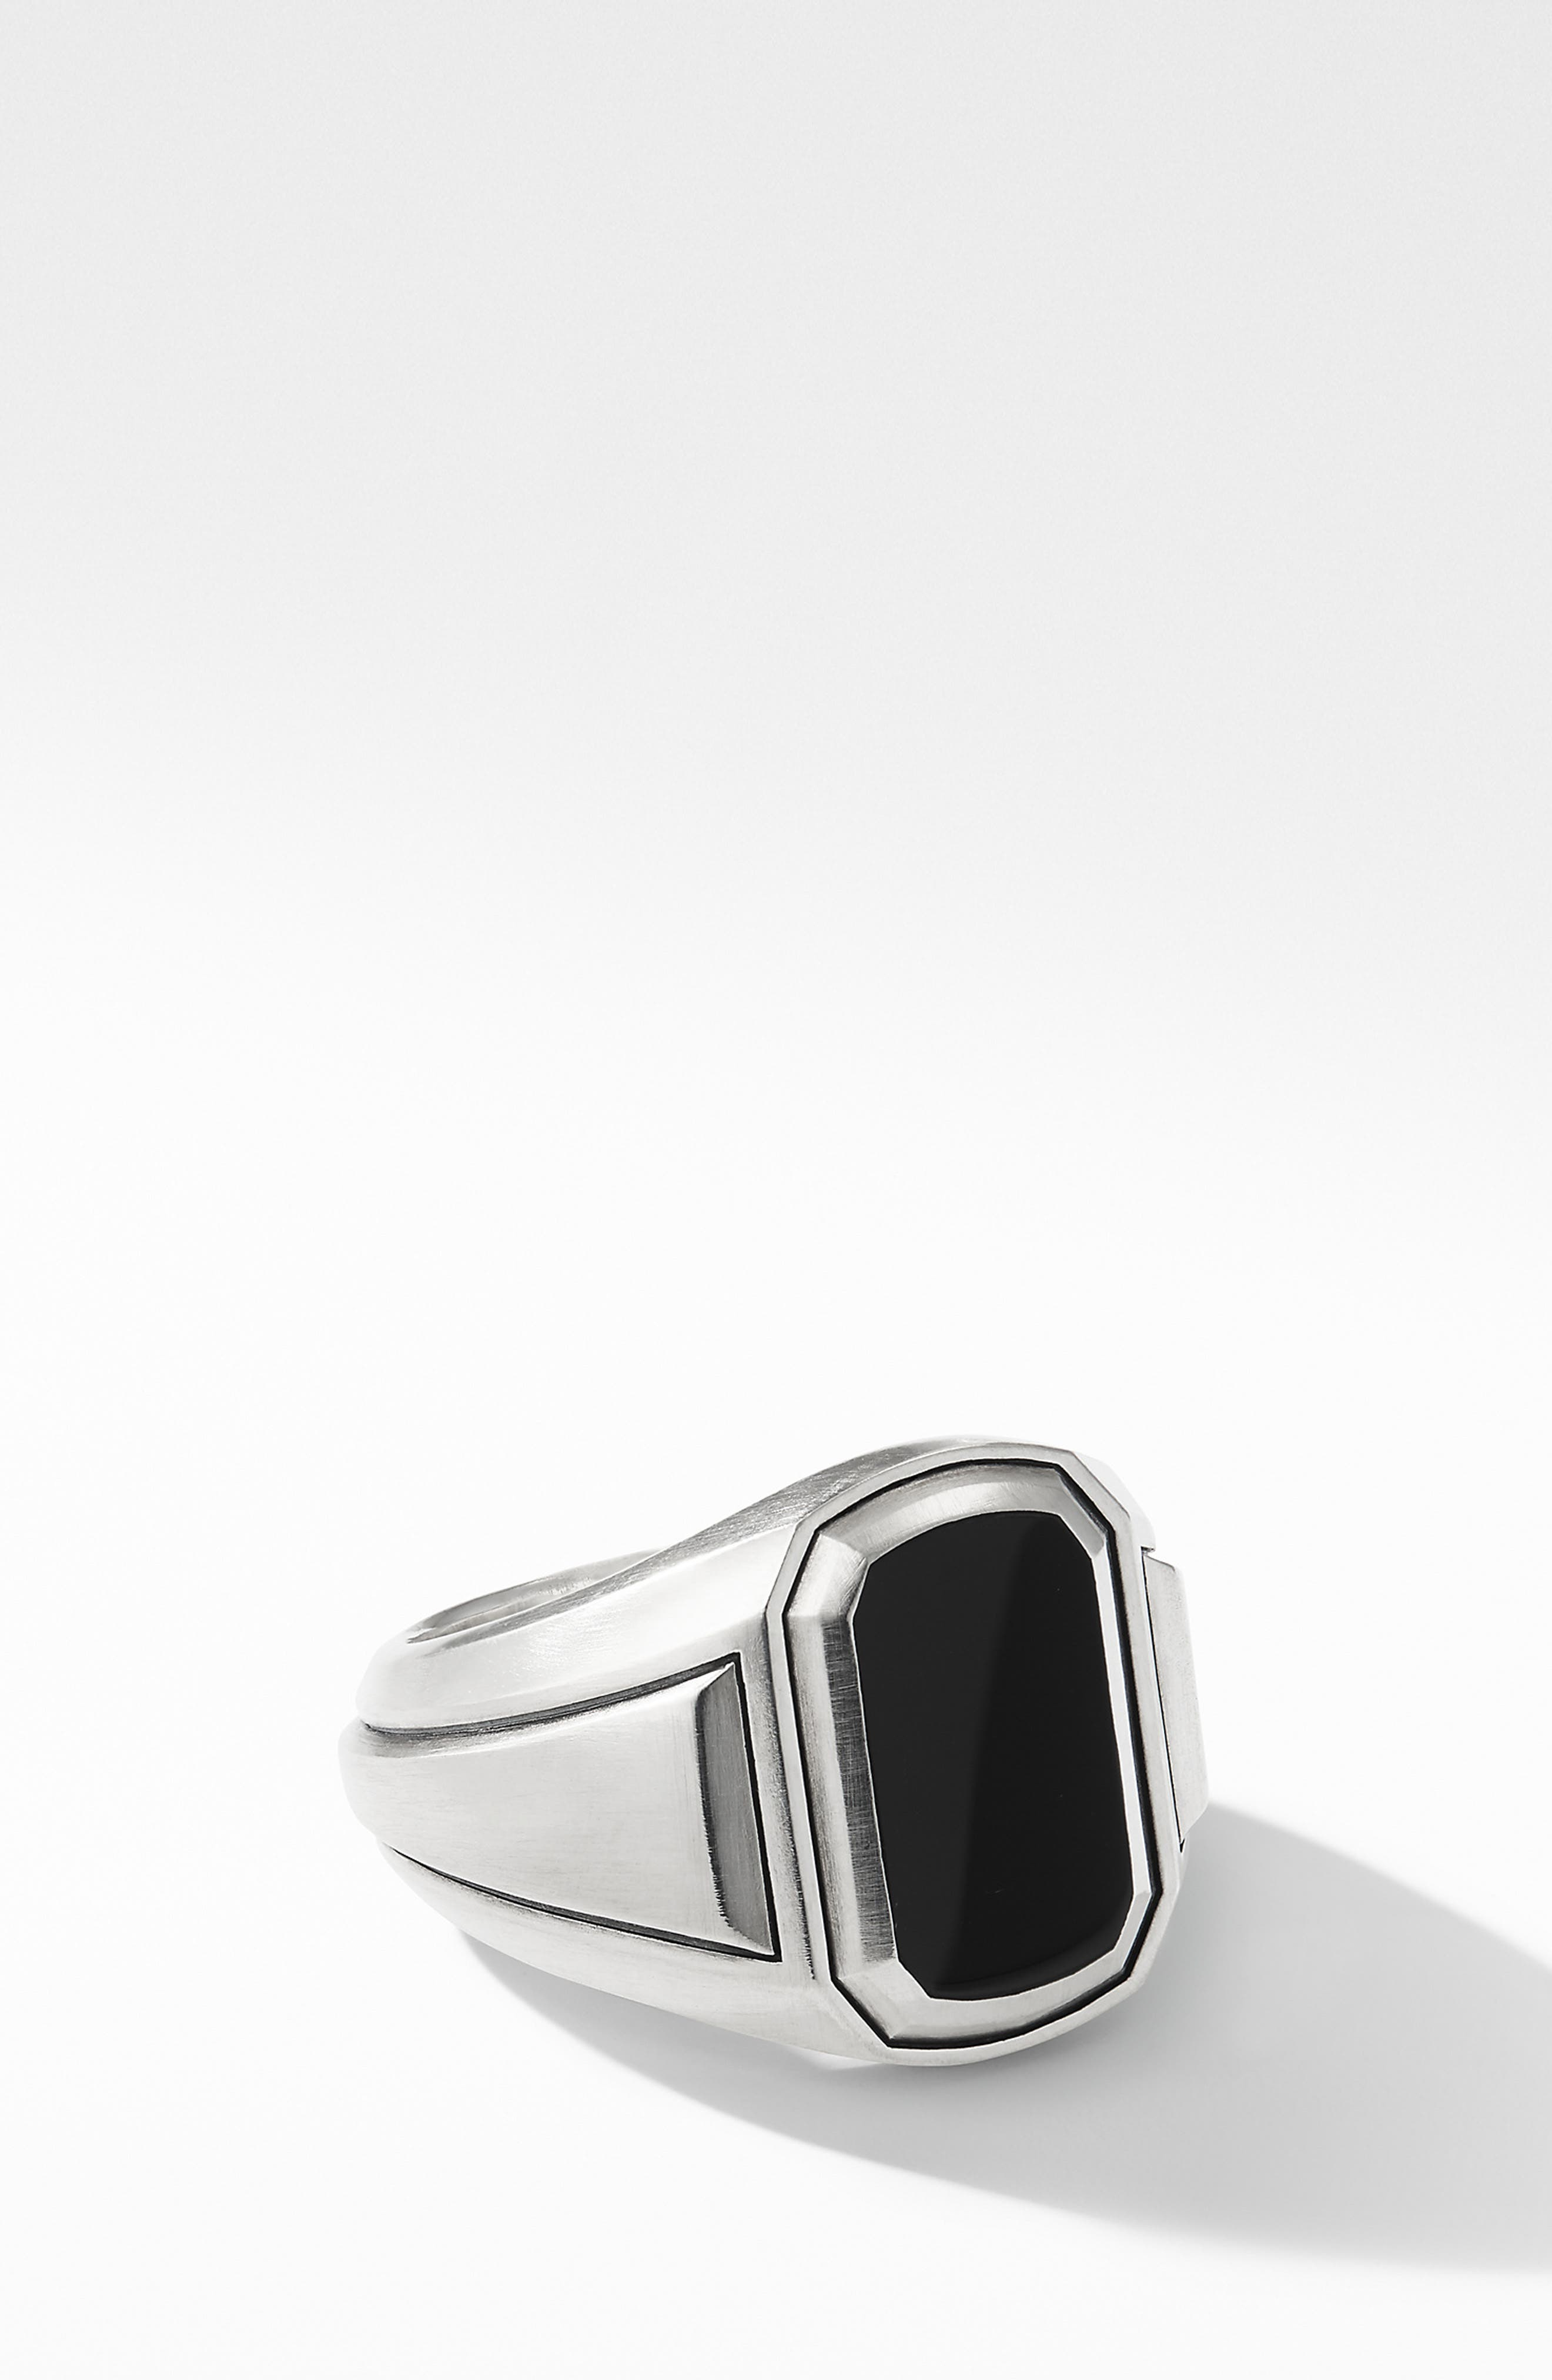 Deco Signet Ring with Black Onyx,                             Main thumbnail 1, color,                             BLACK ONYX